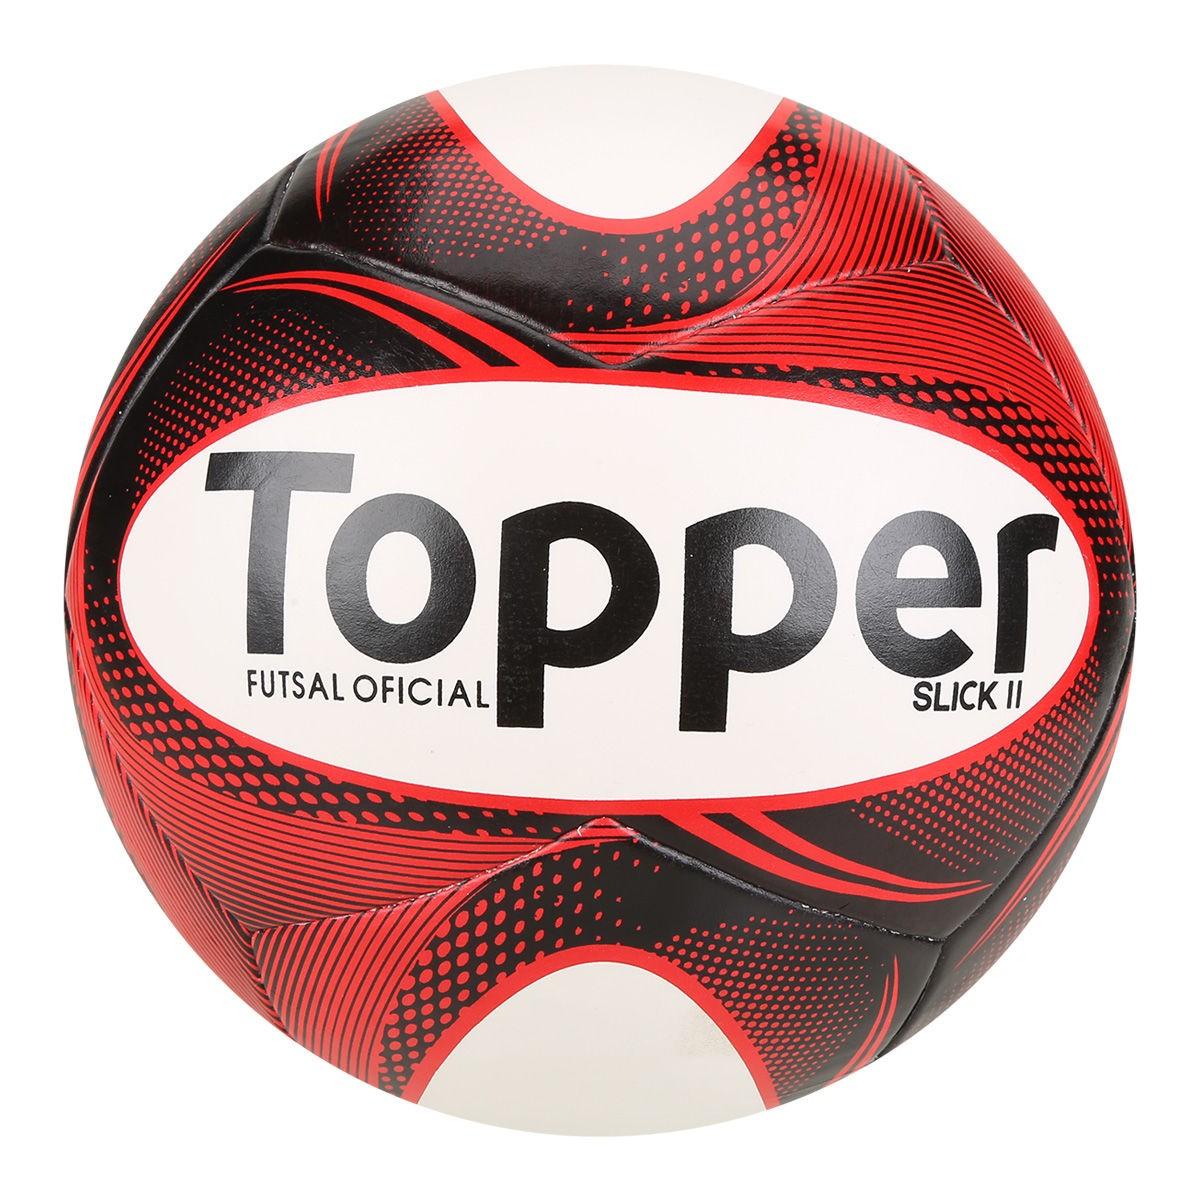 8312cc59be Bola Futsal Slick II - Topper